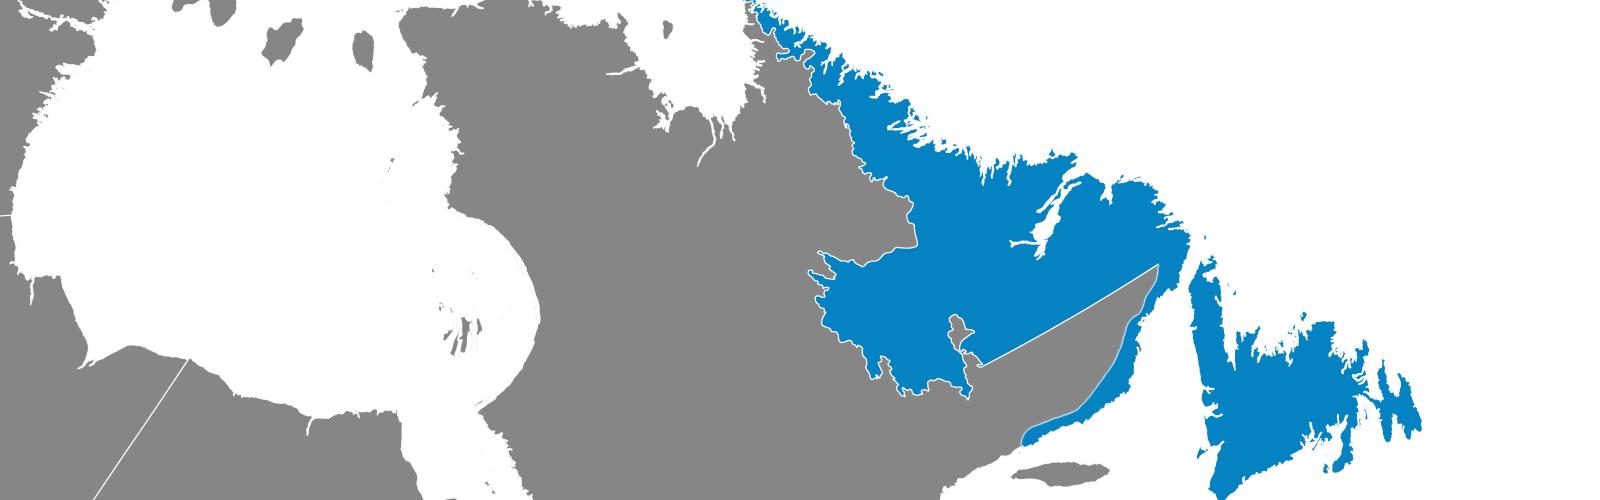 adg-coverage-map-2